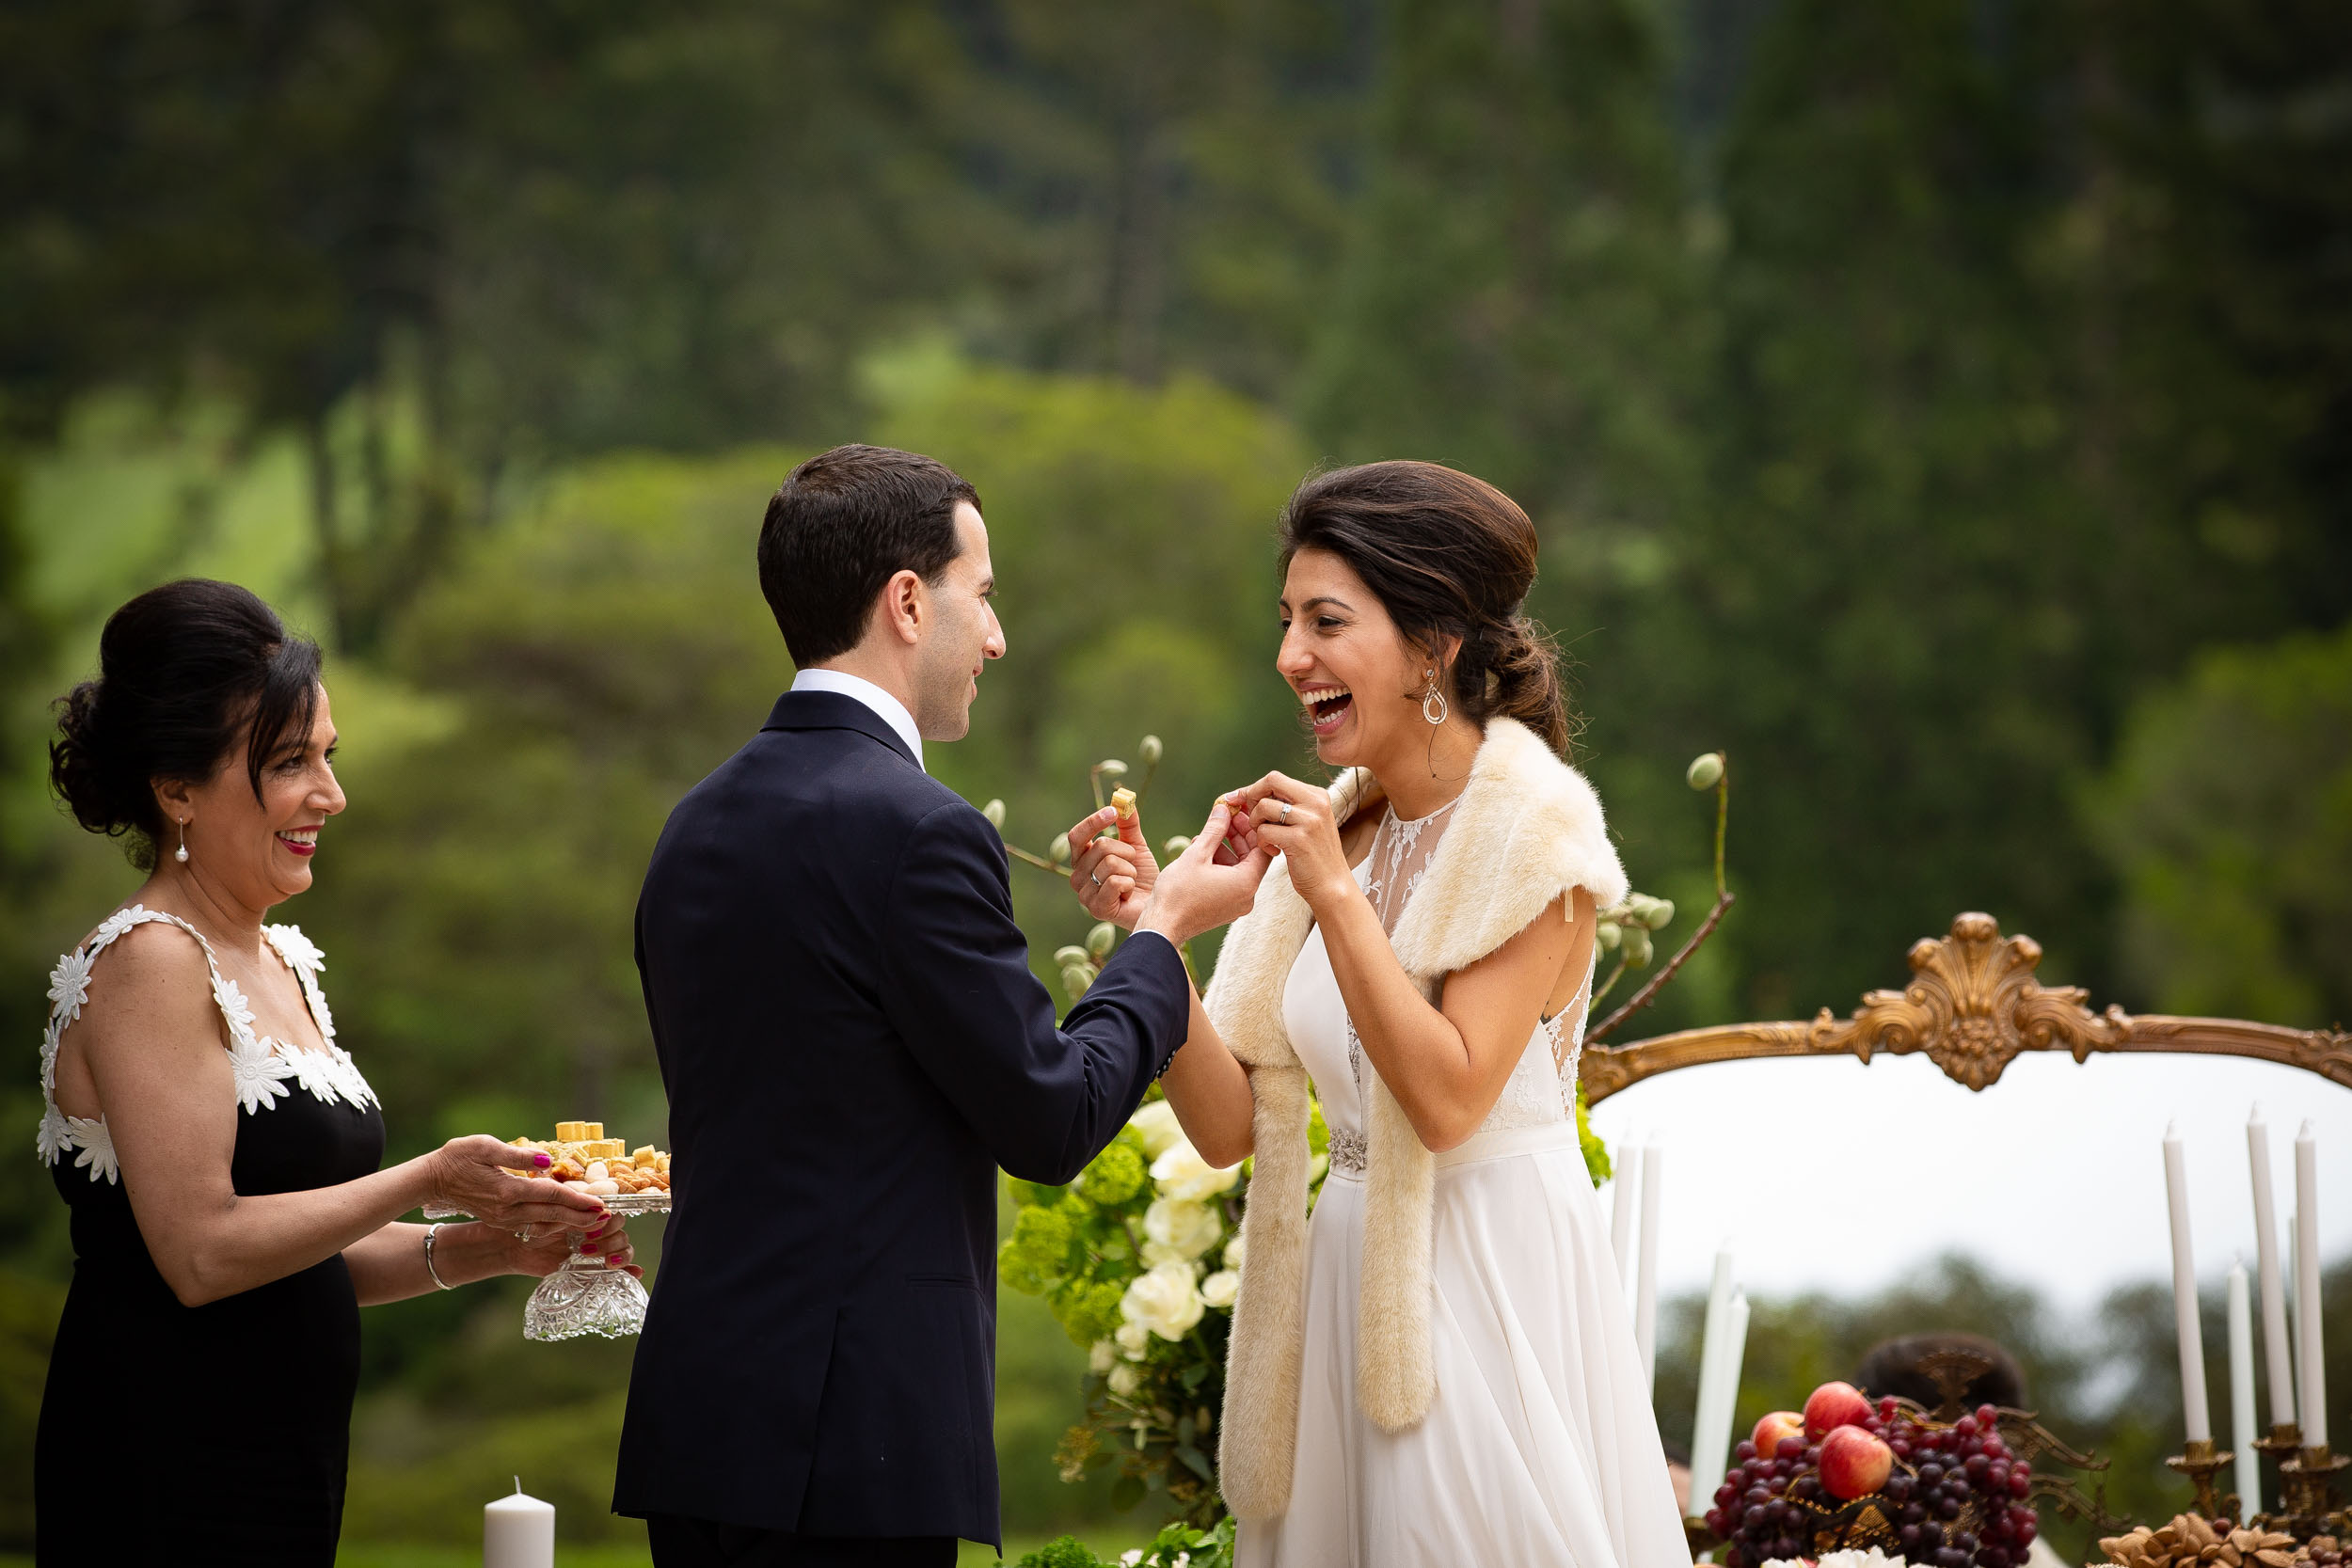 Brazilian-Room-wedding-Persian-ceremony-68.jpg